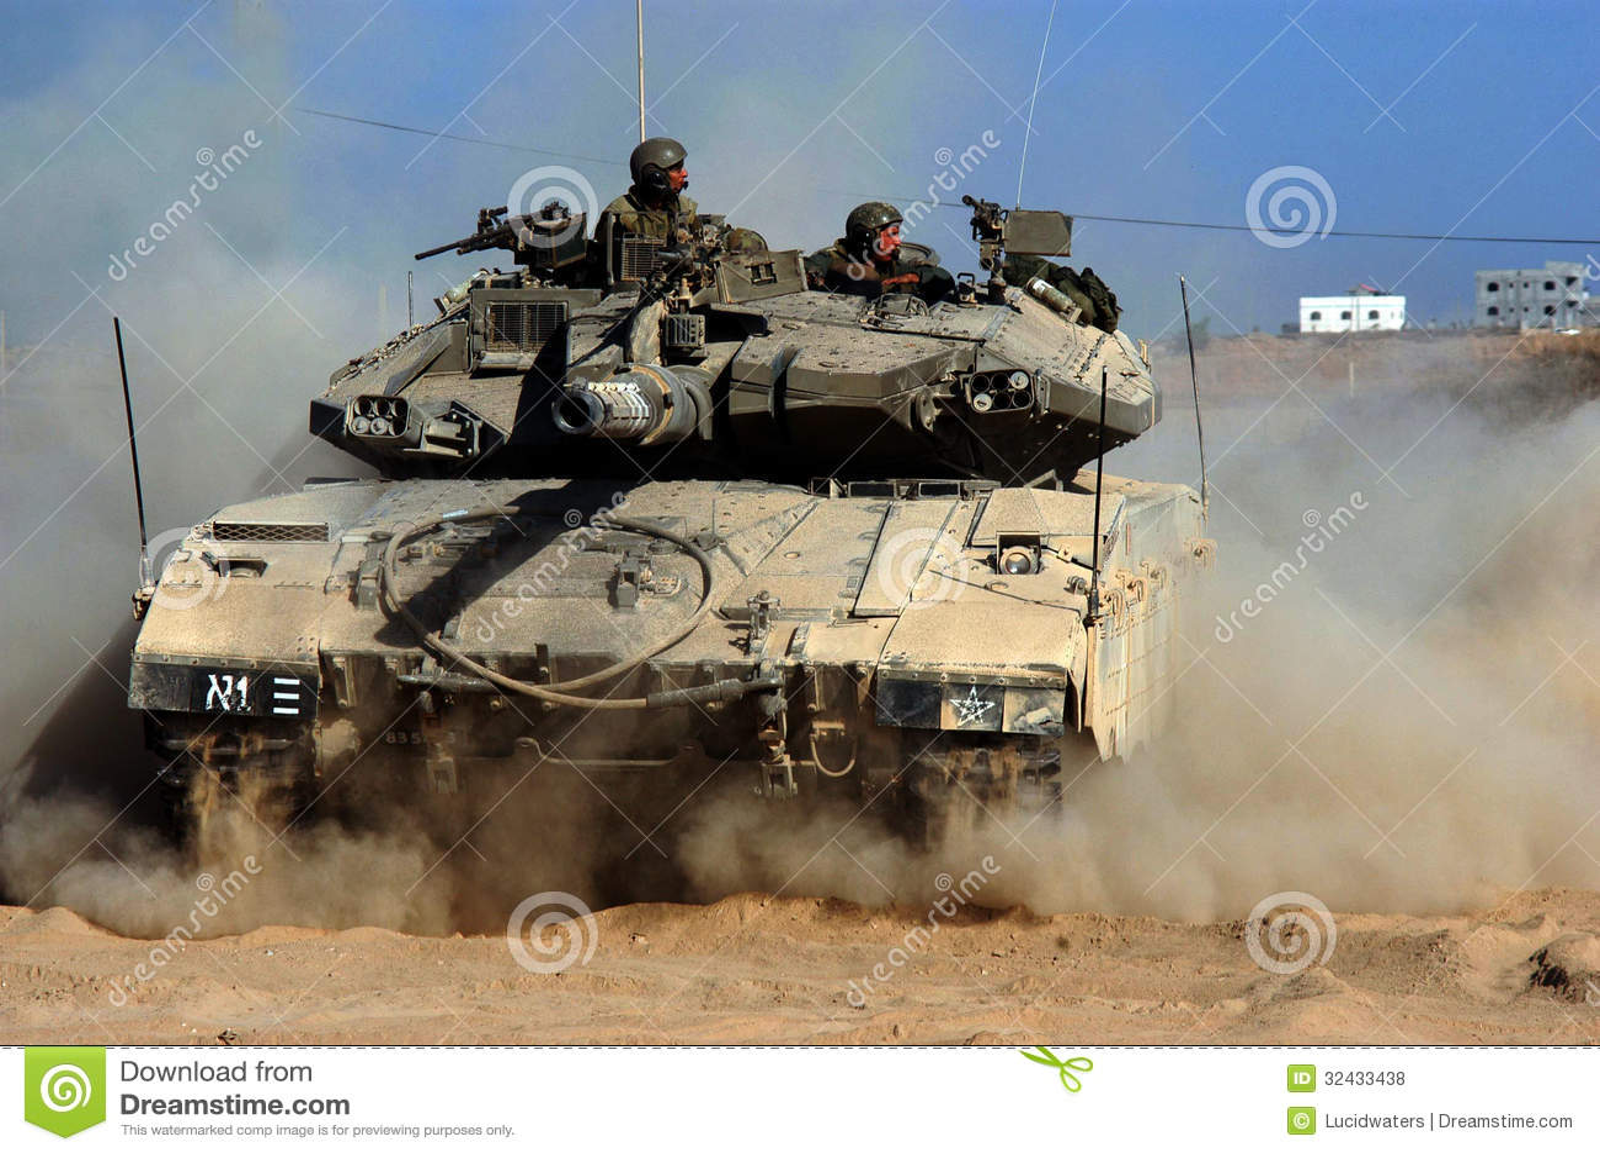 israel palestine conflict essays